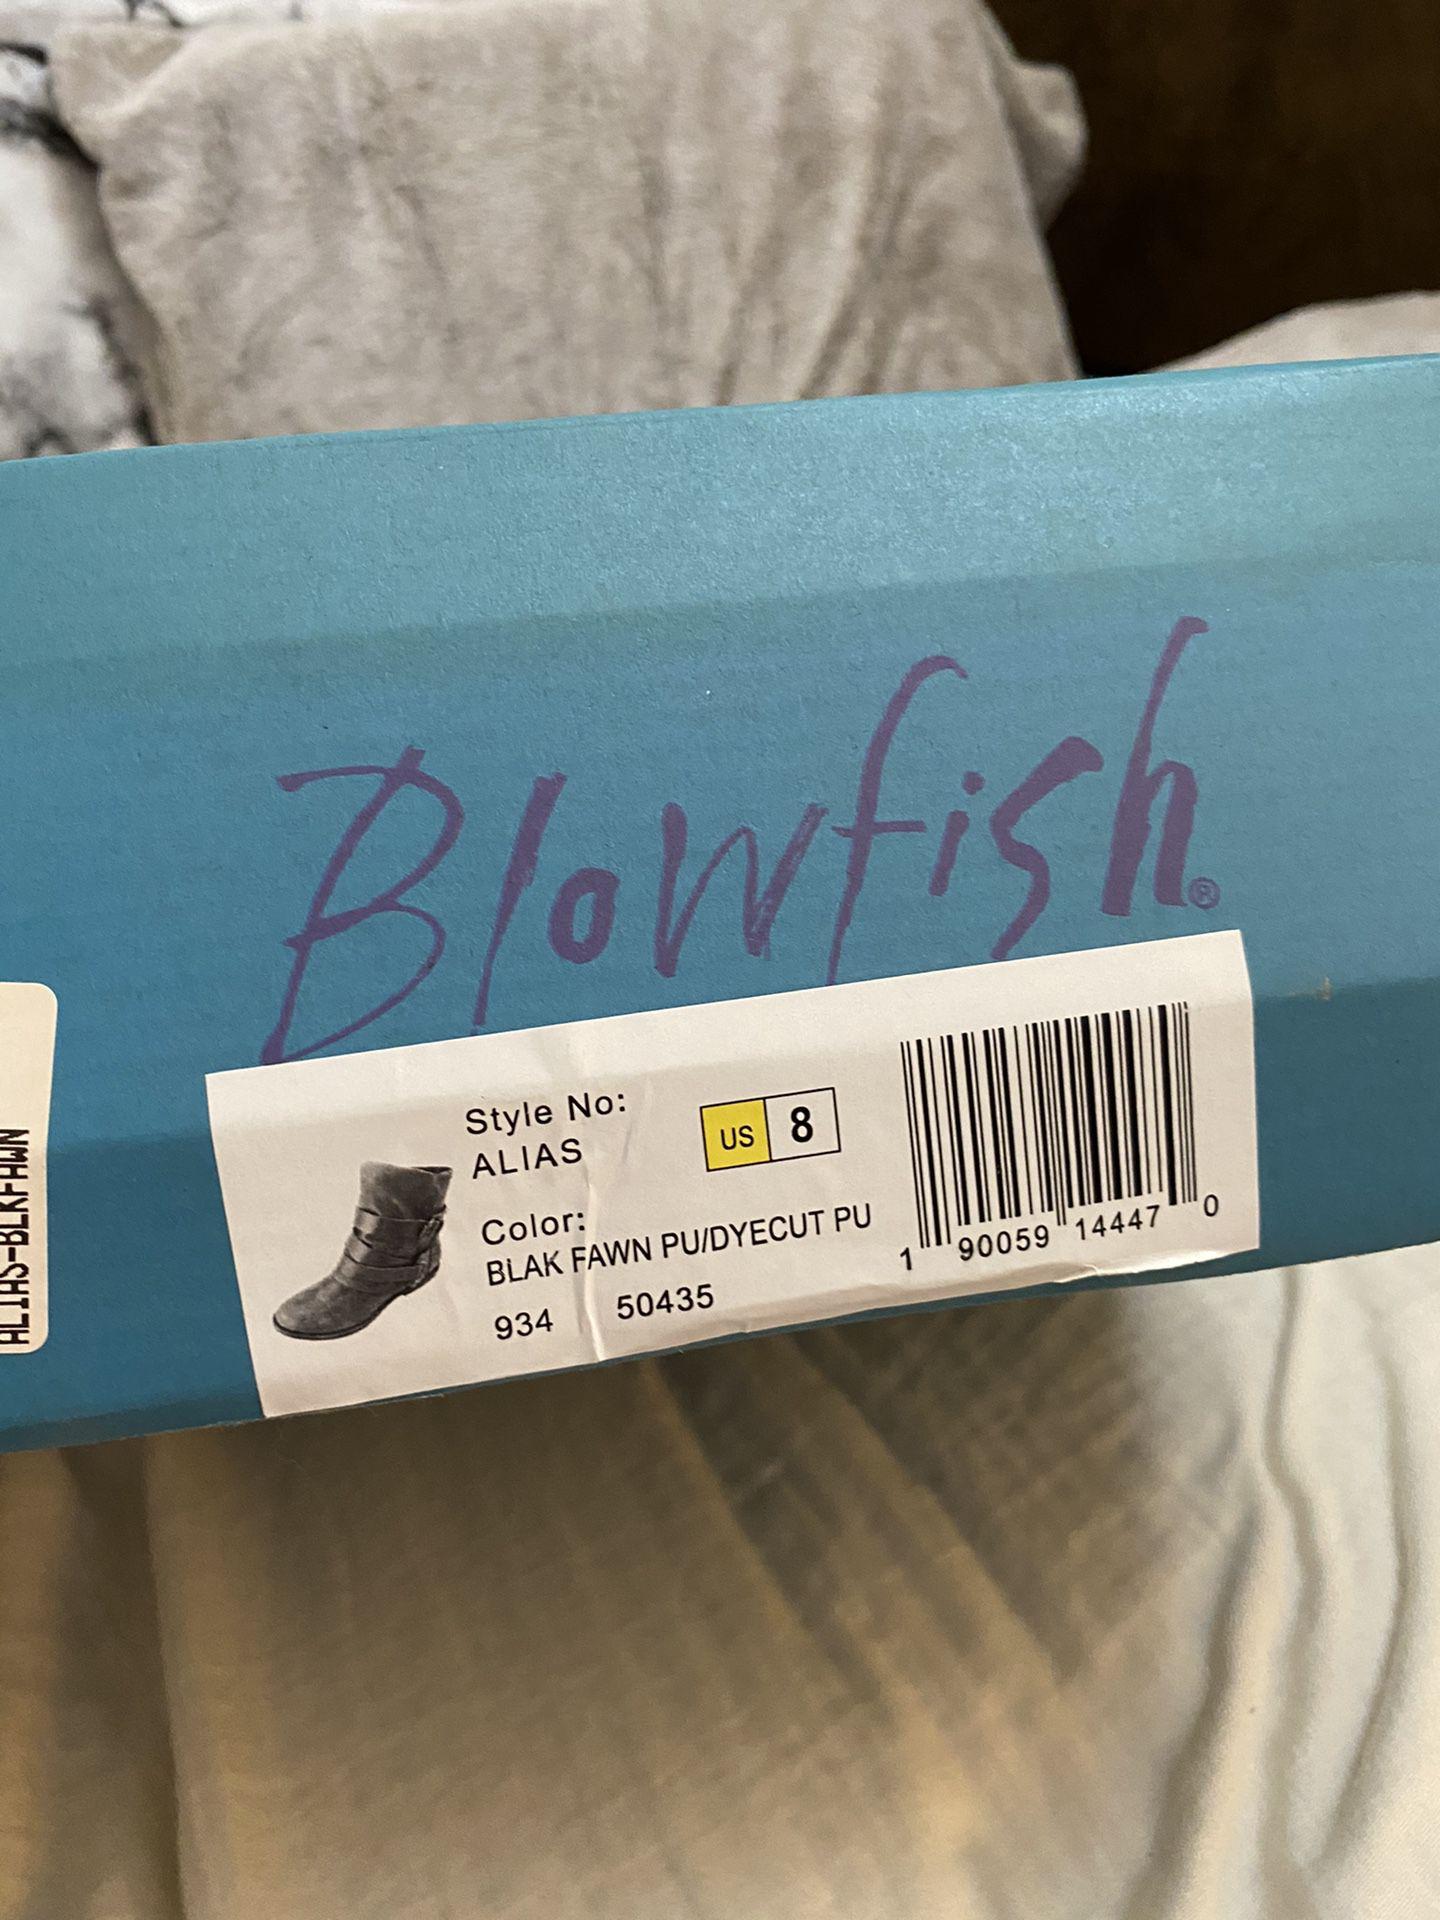 Blowfish boots